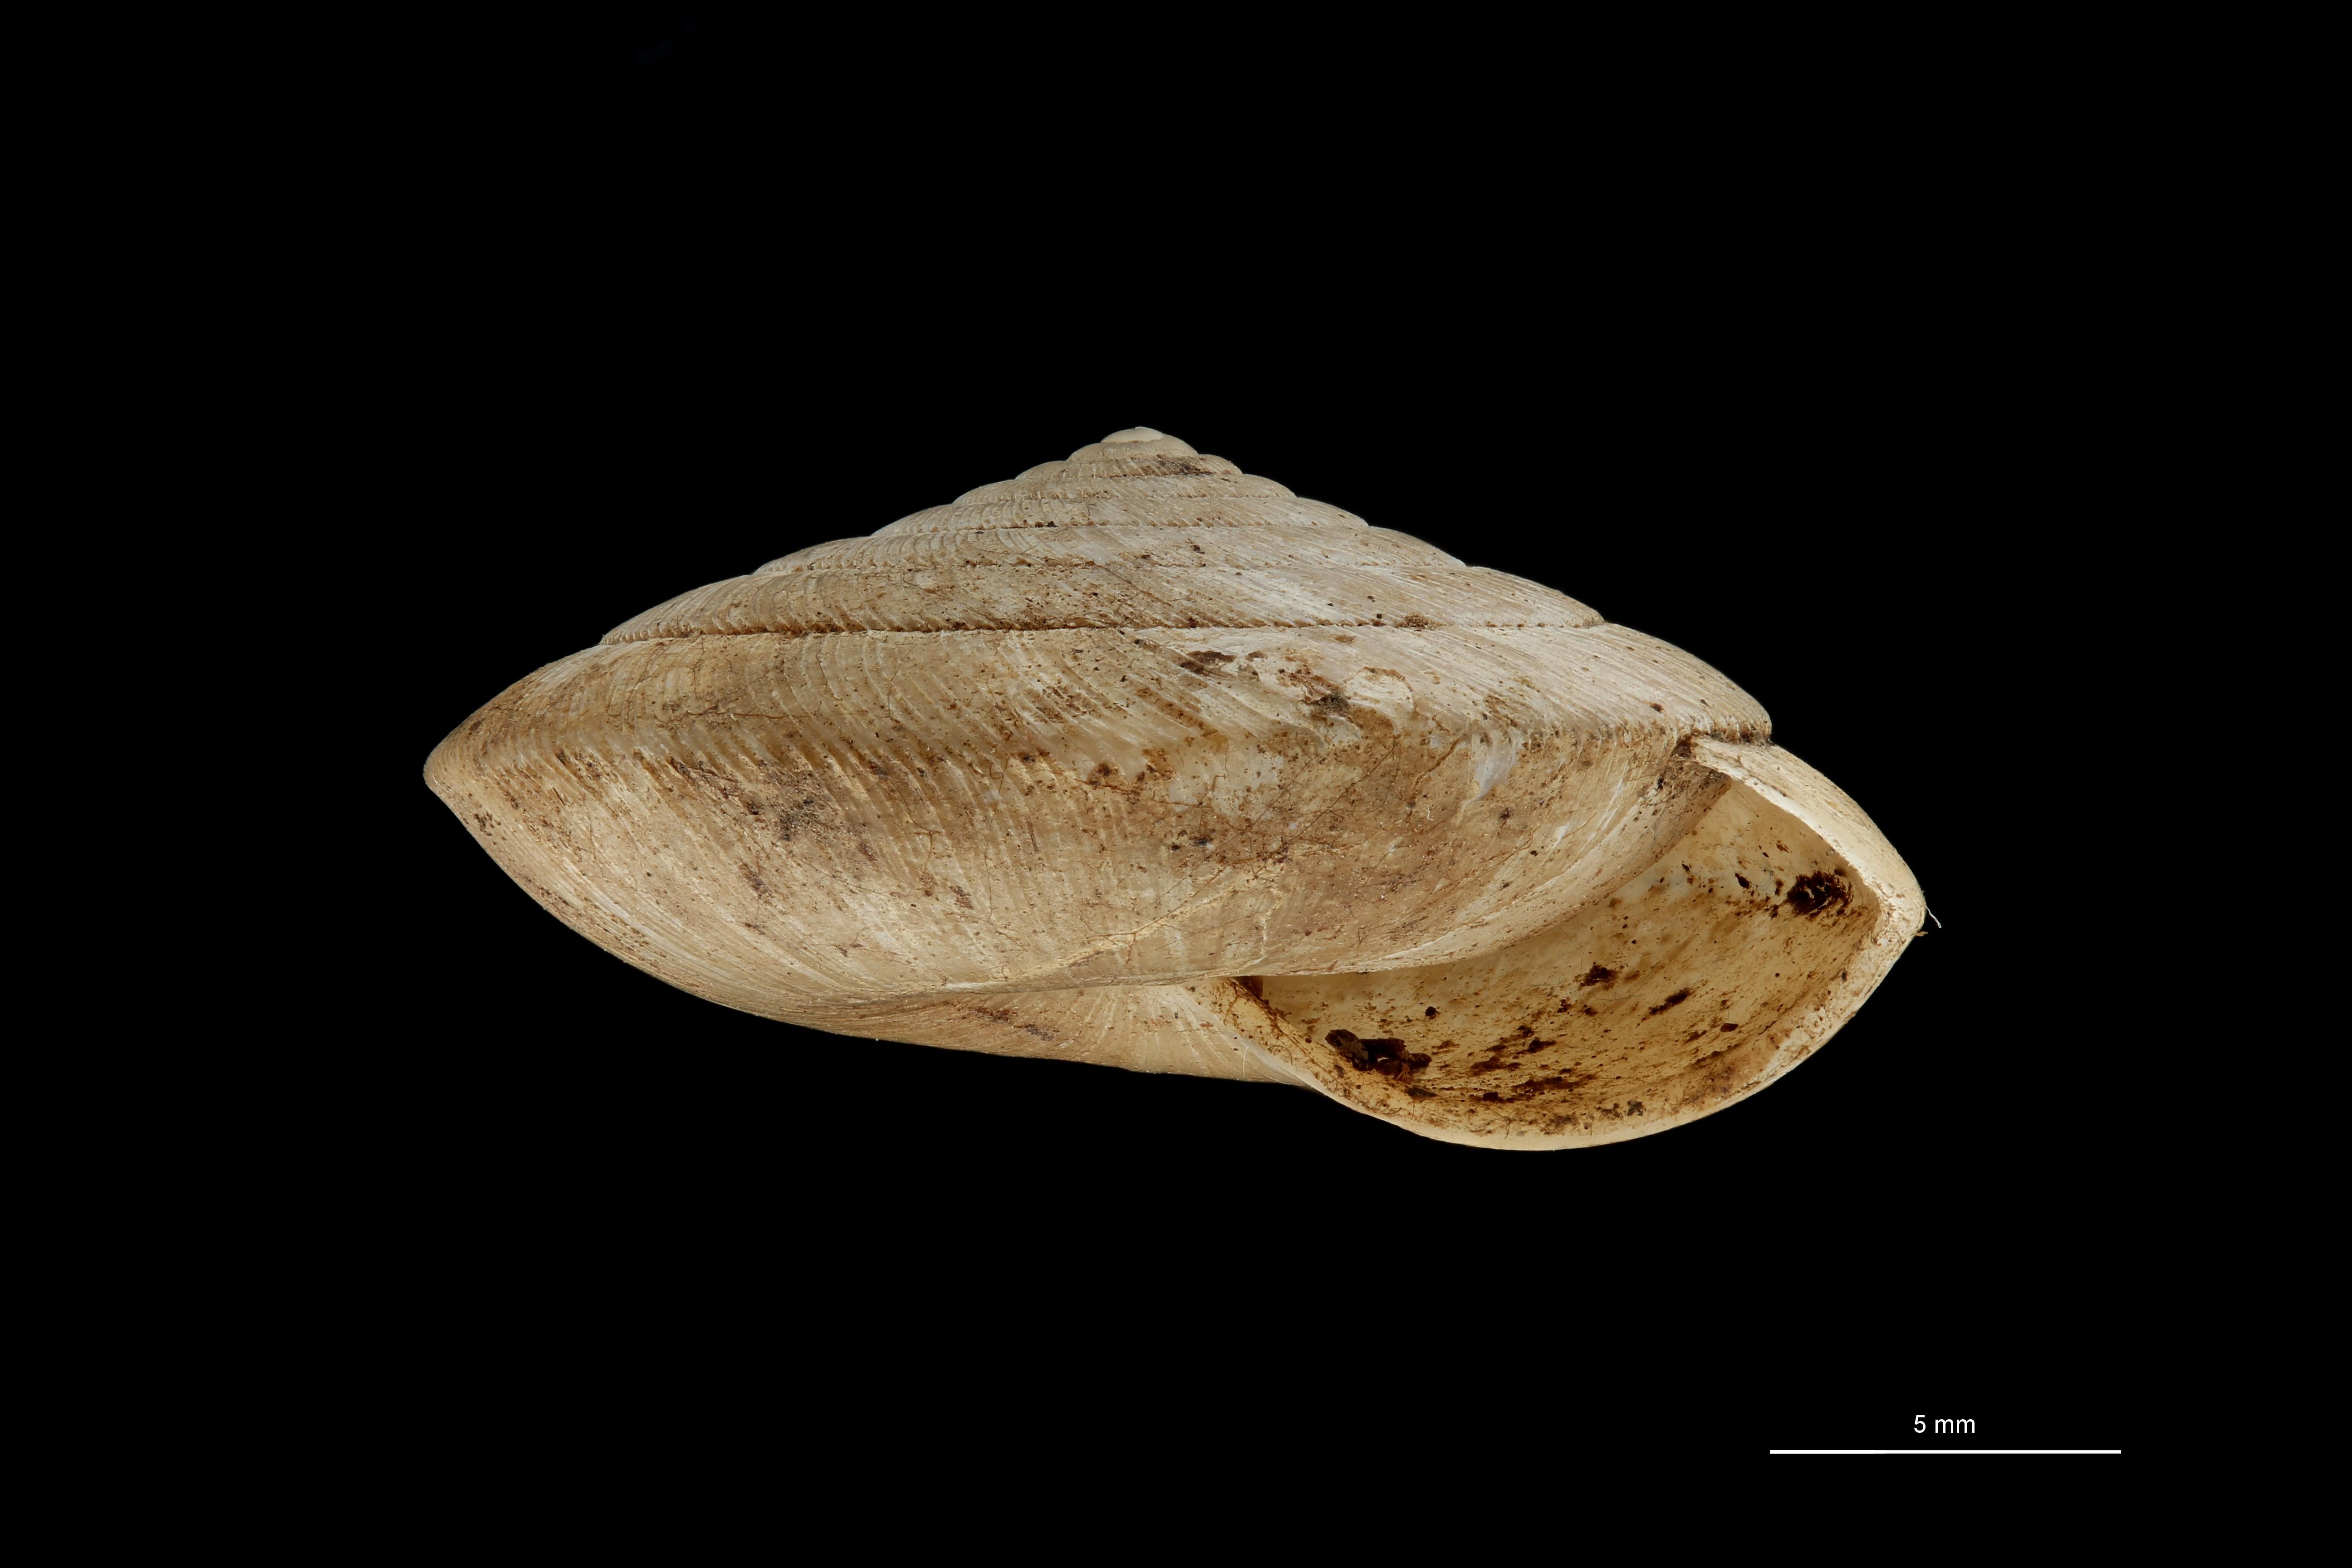 BE-RBINS-INV TYPE MT 689 Khasiella rosenbergiana LATERAL ZS PMax Scaled.jpg